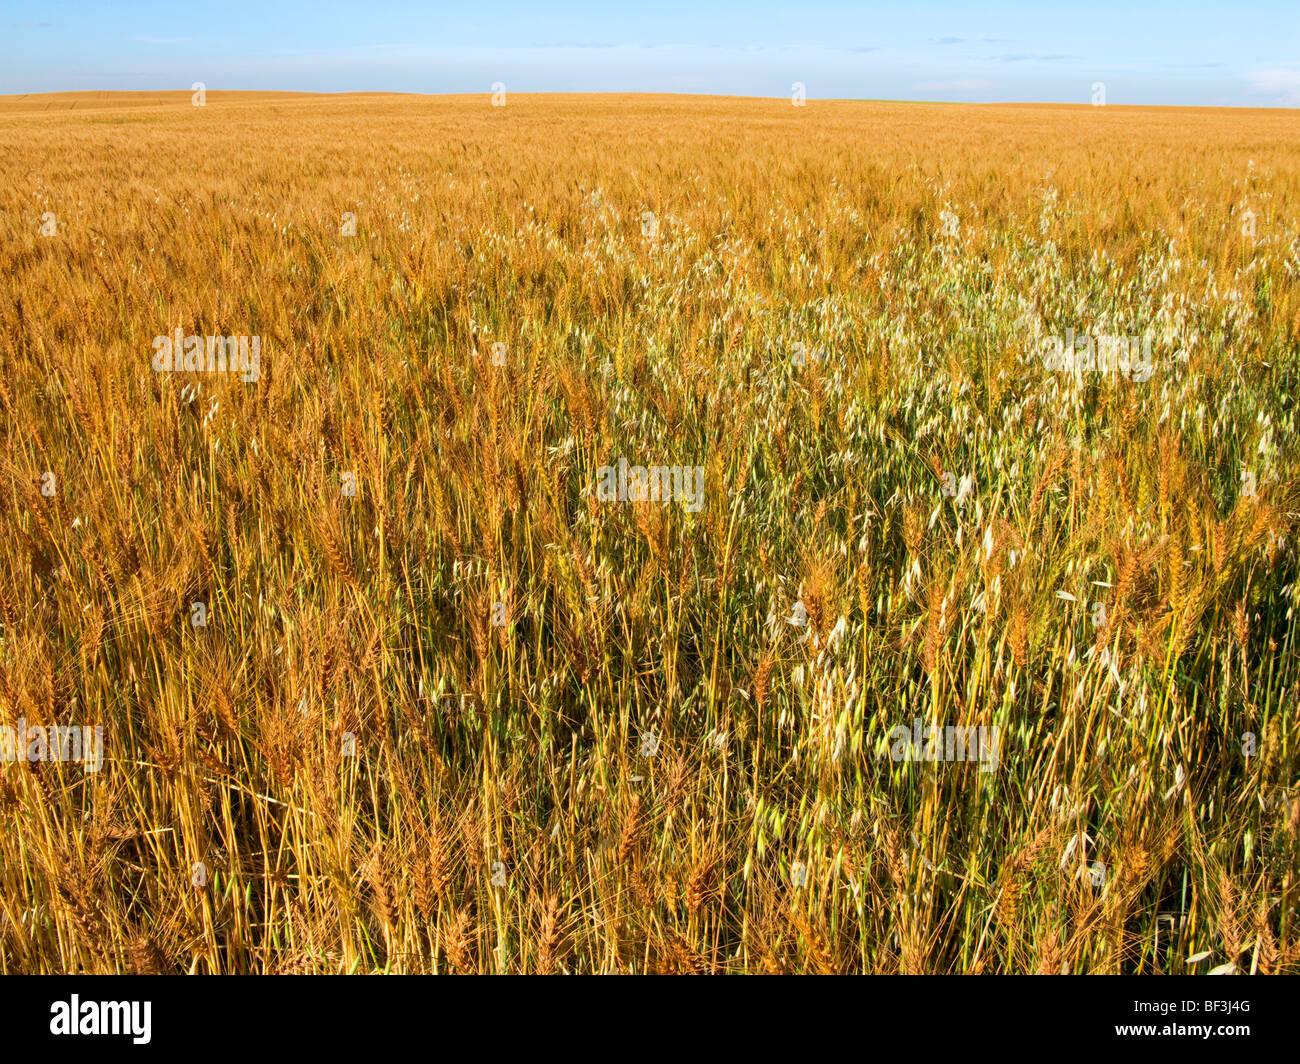 Livestock - Wild oat (Avena fatua) patch infests a ripening grain field / Alberta, Canada. - Stock Image